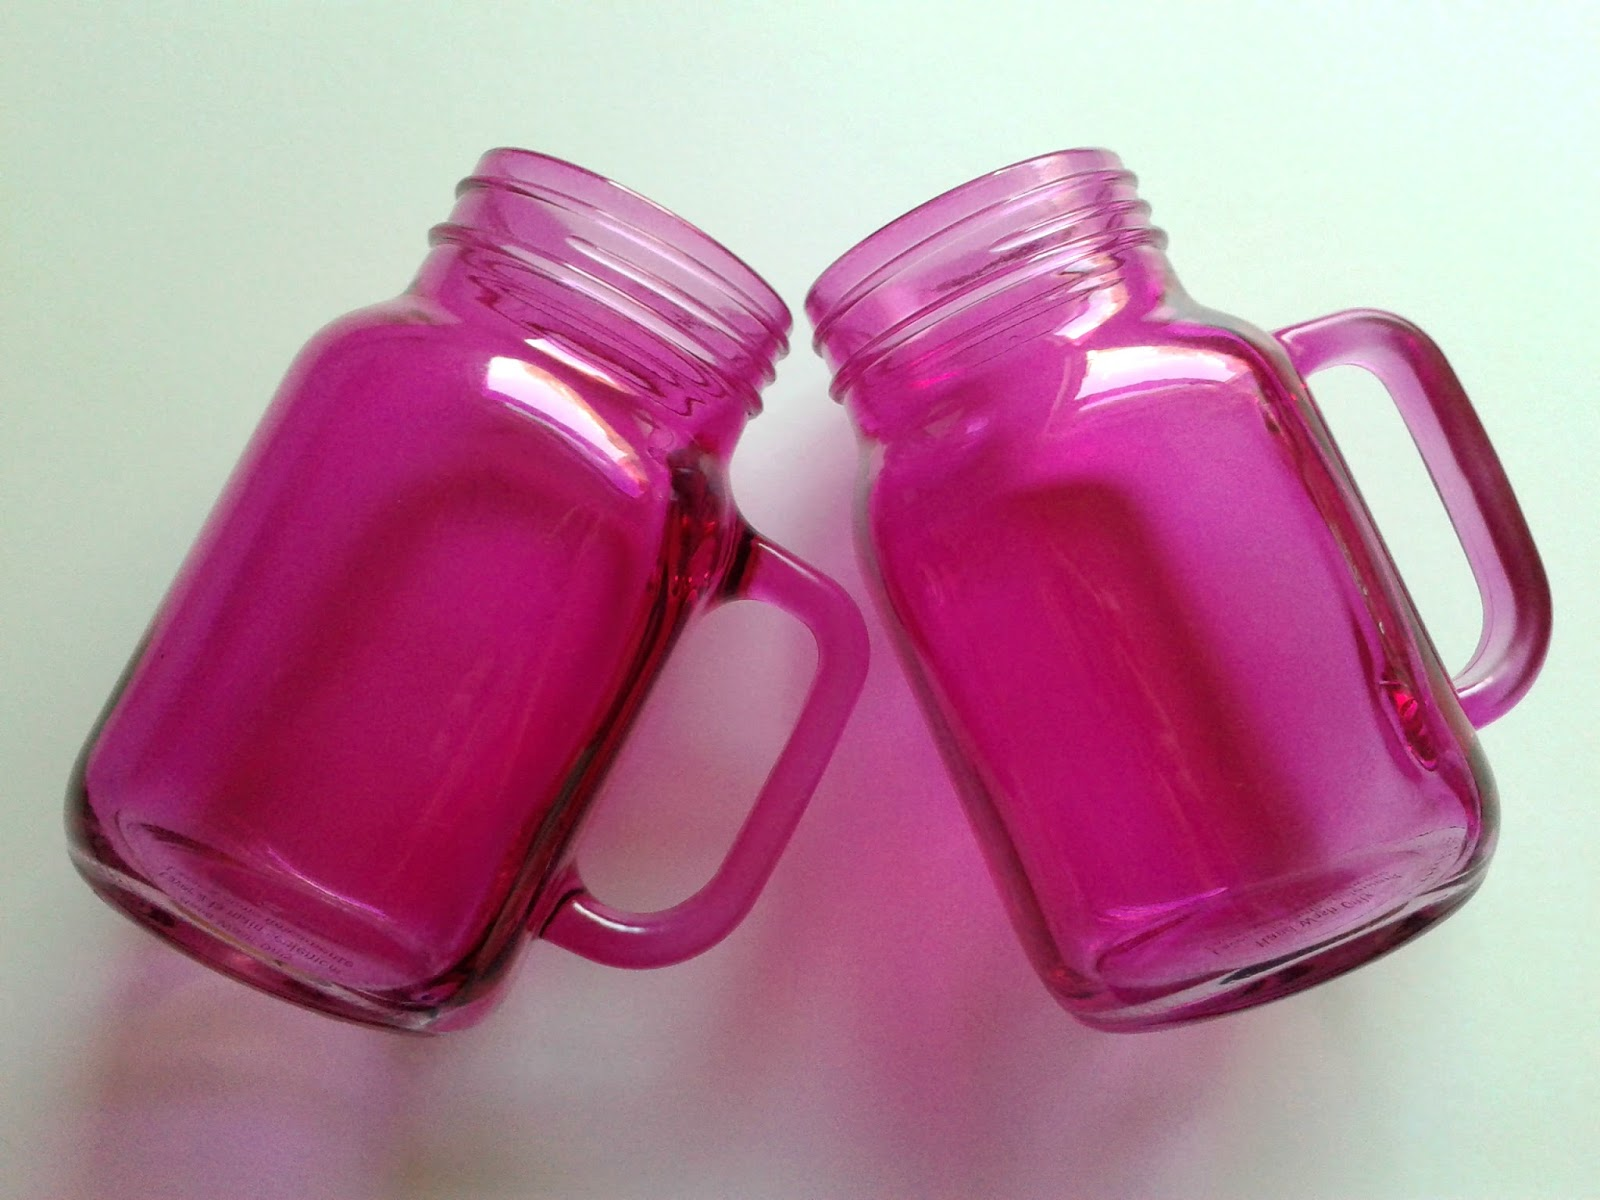 Michael's Pink Glass Jars Haul